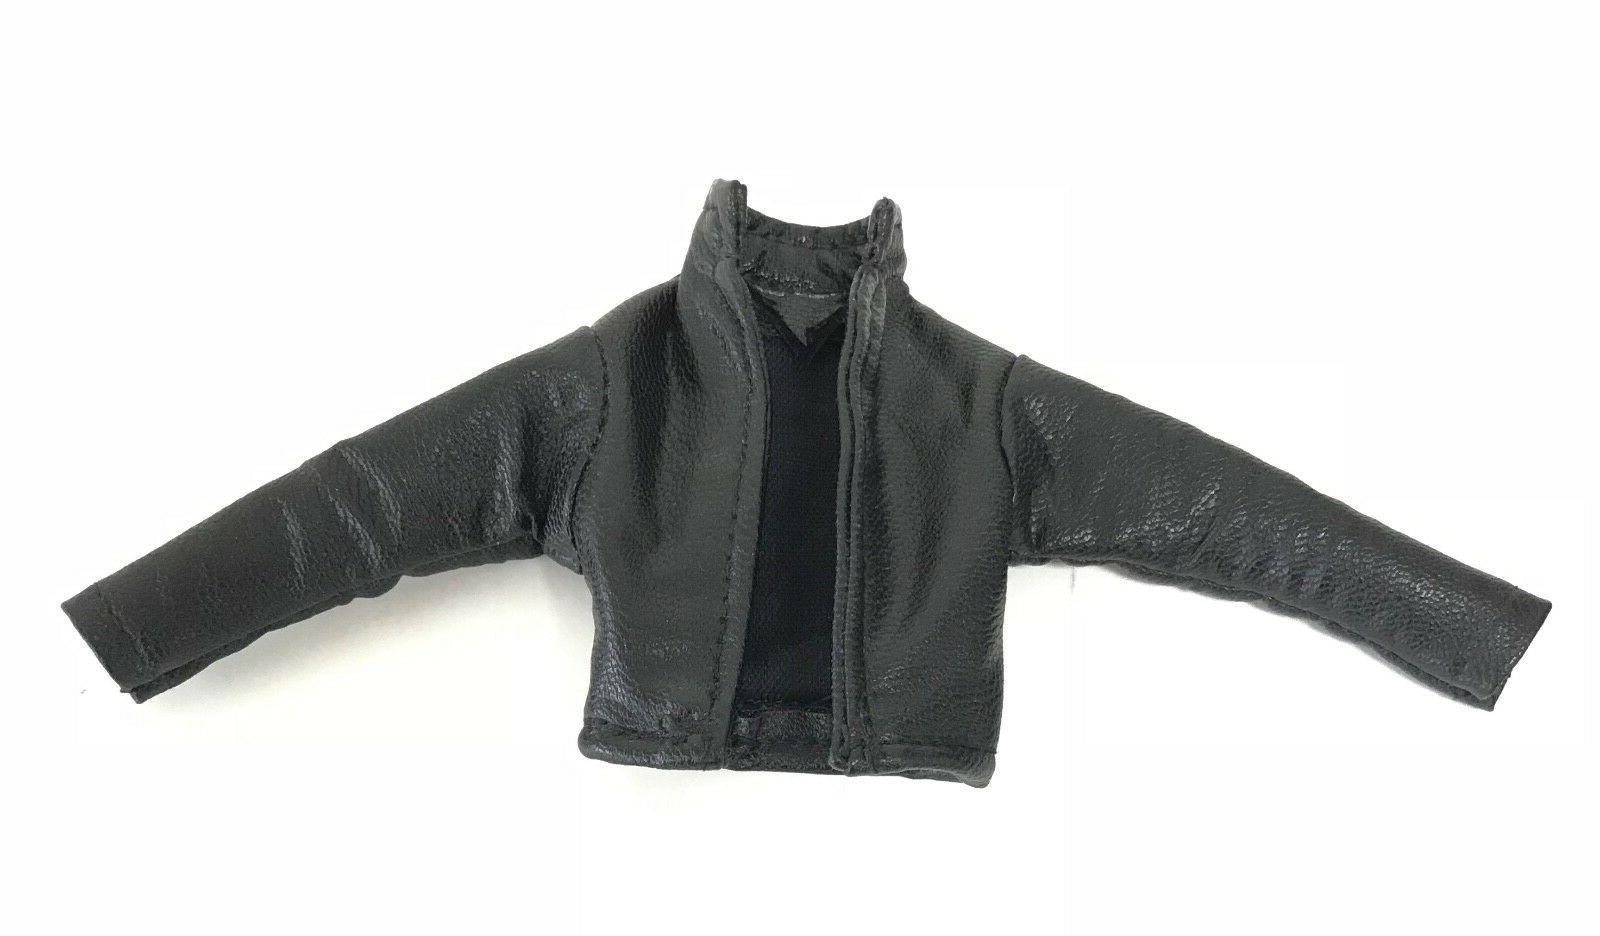 SU-JKM1-BK: Black Short Jacket Mezco